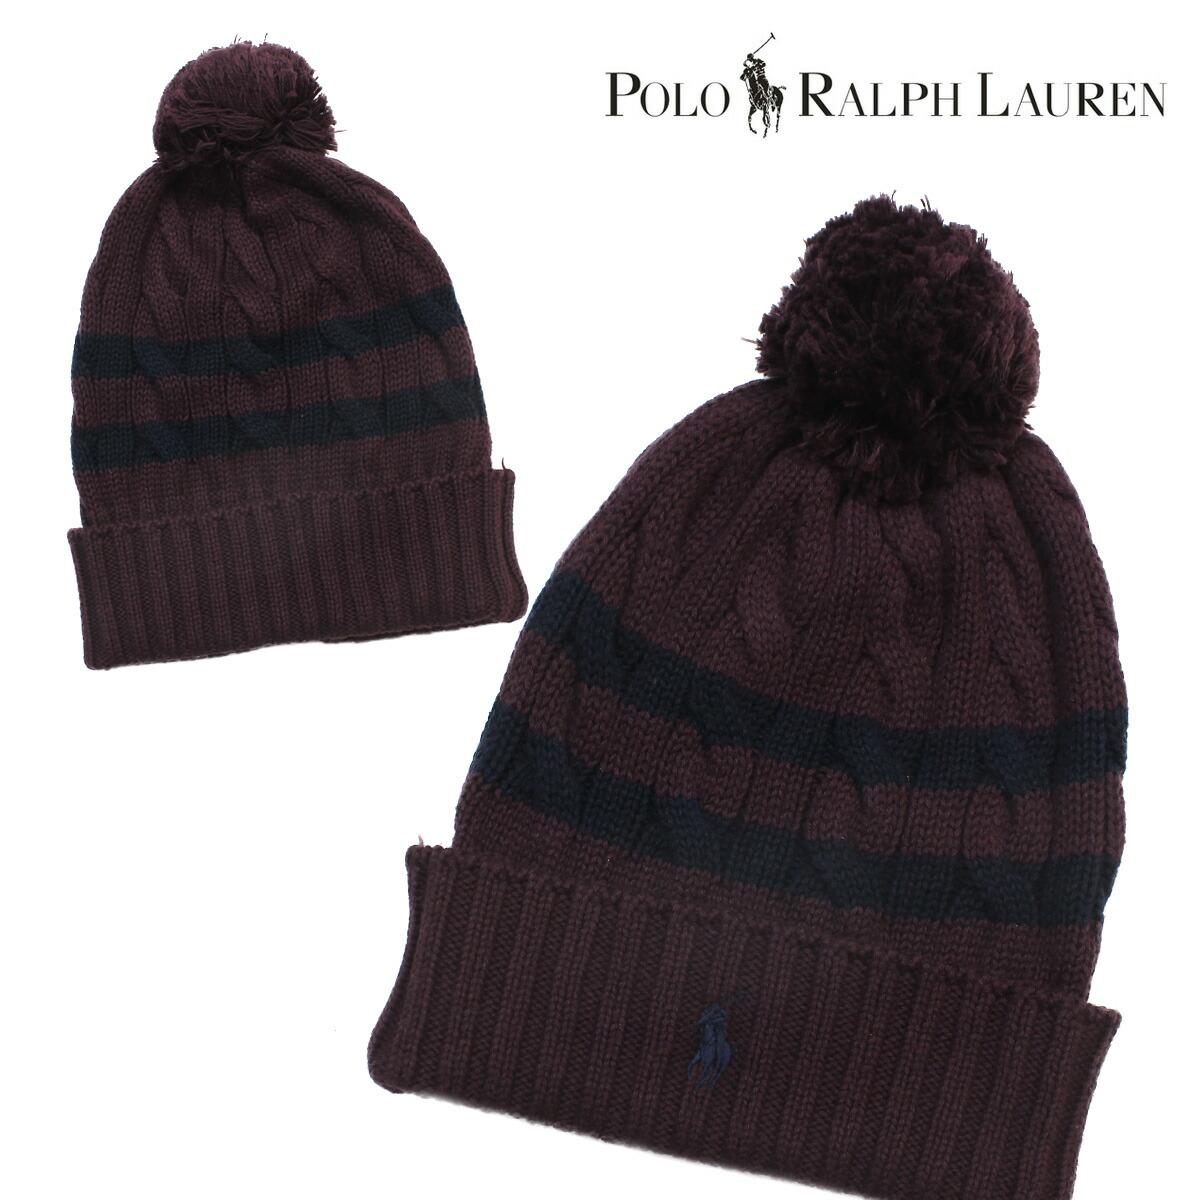 19d5cfaaefcf5 ralph lauren knit caps